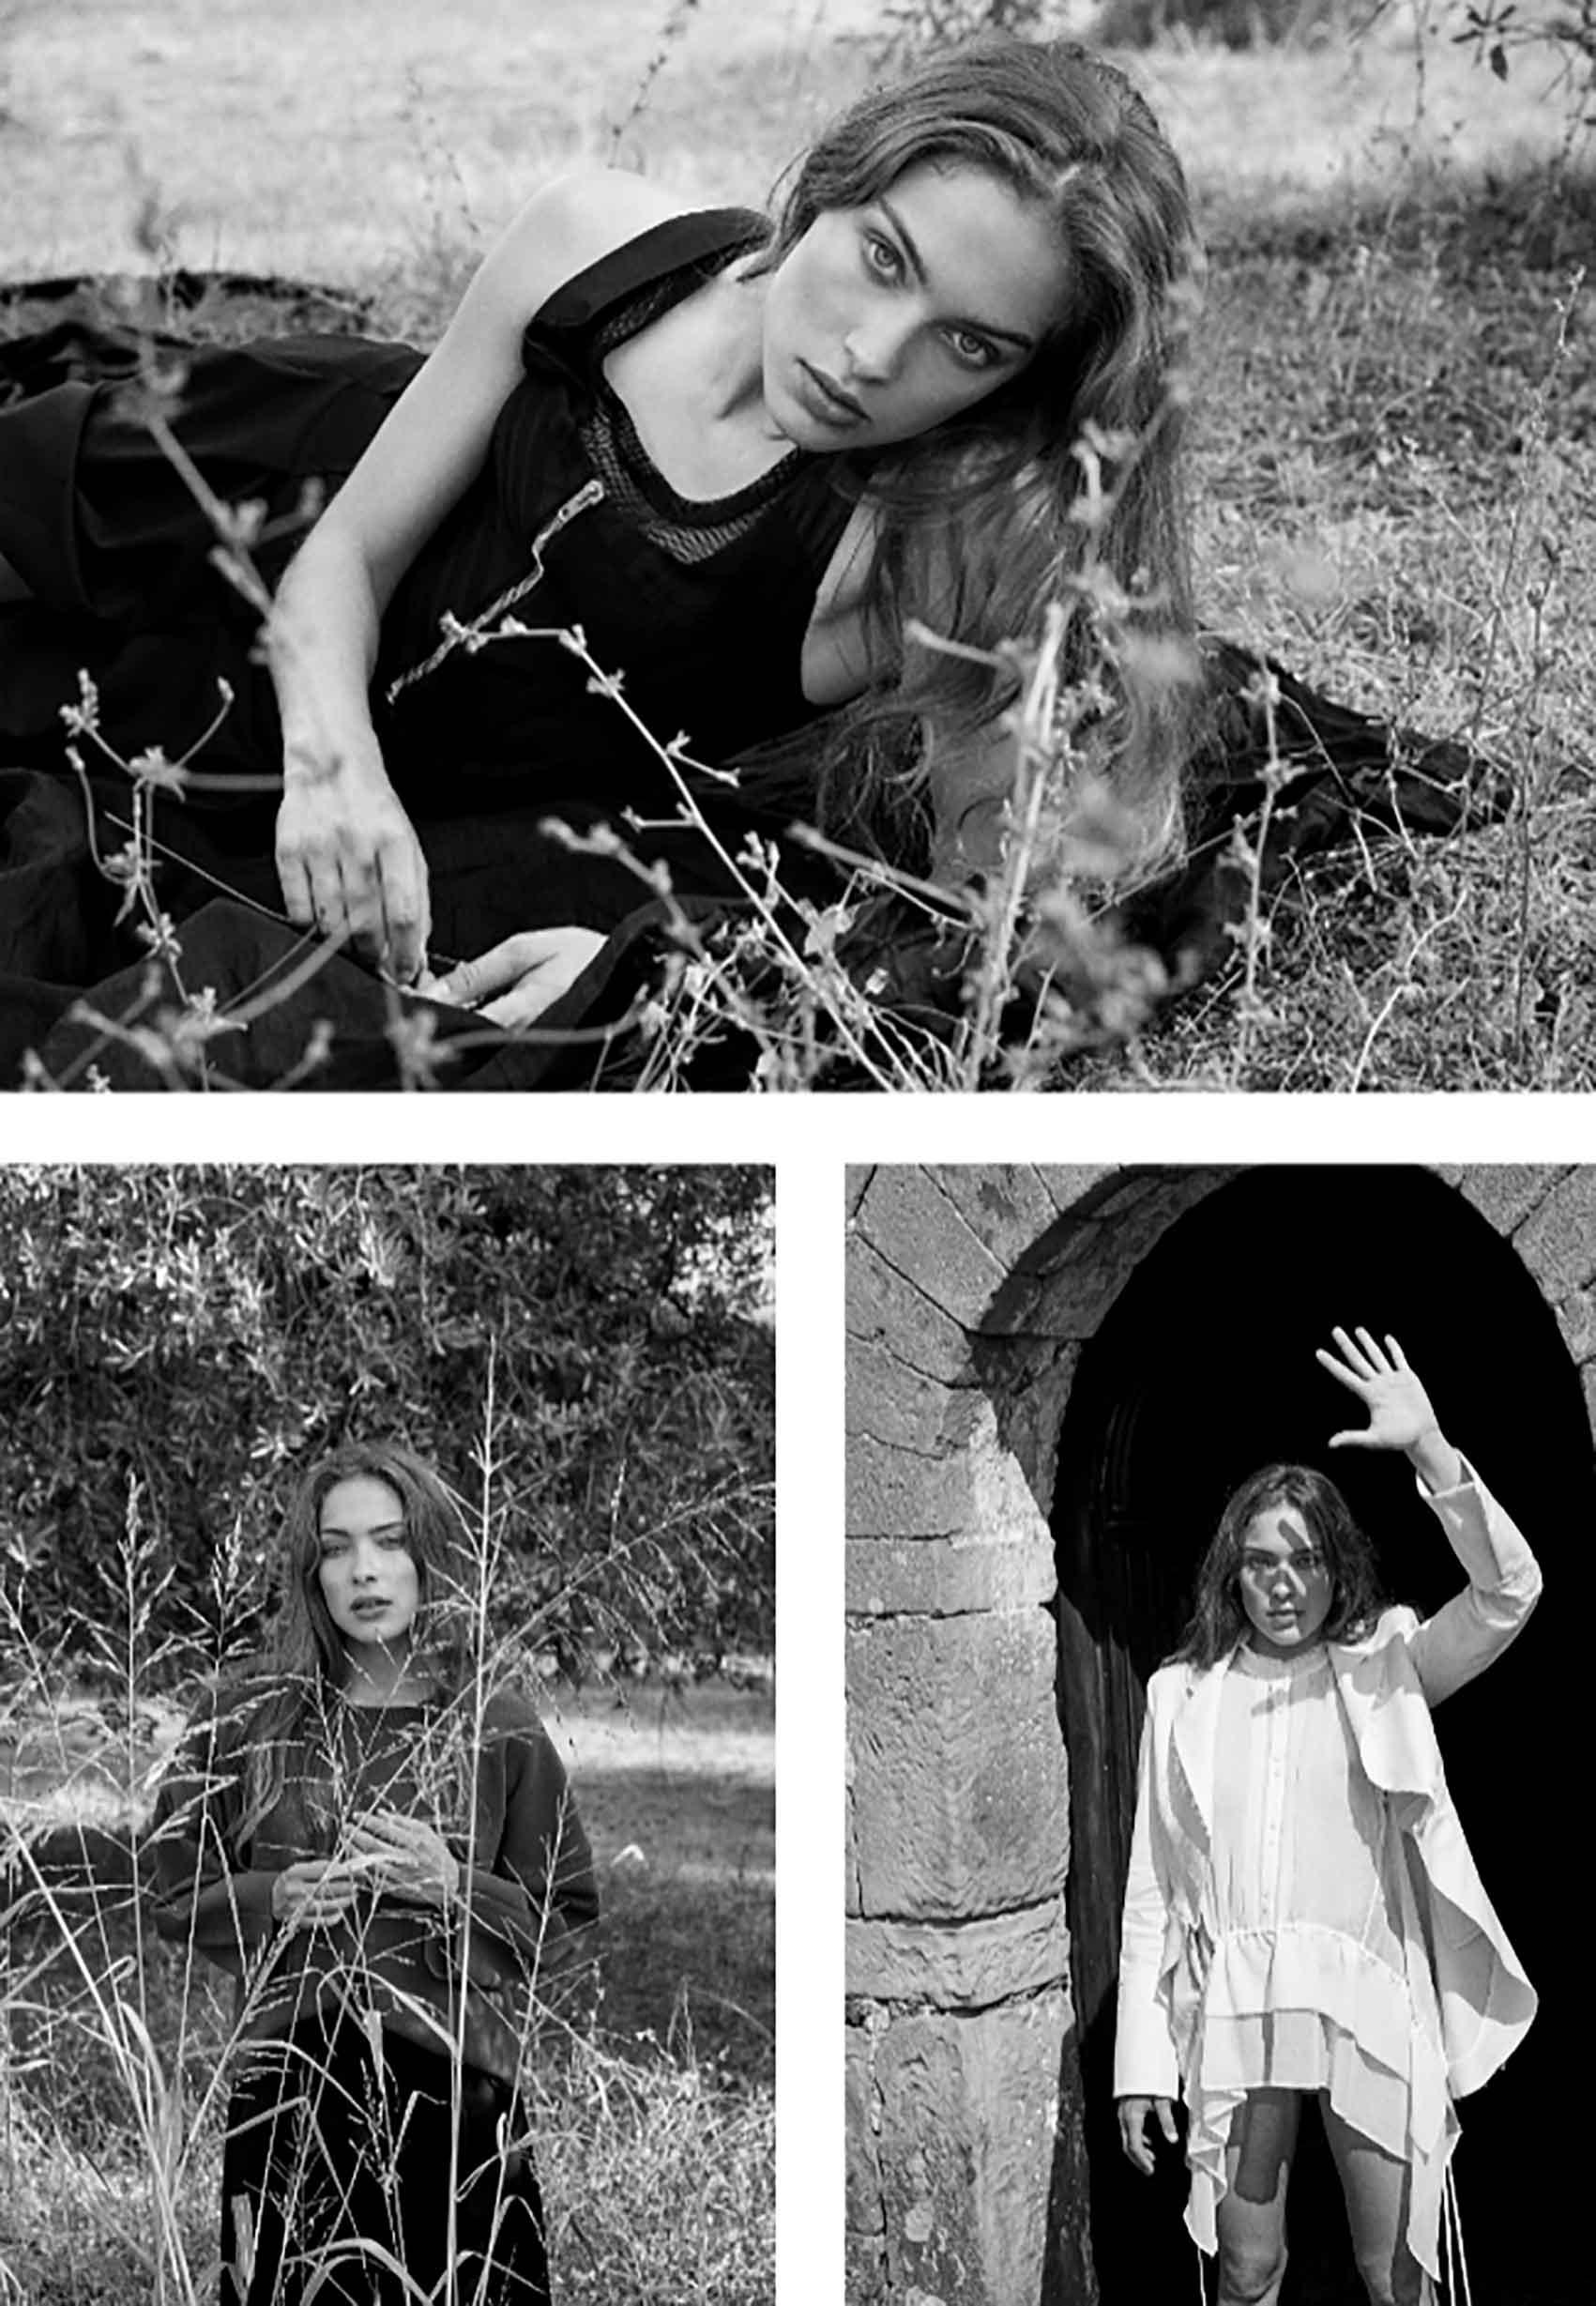 Isabel-Benenato-מגזין-אופנה